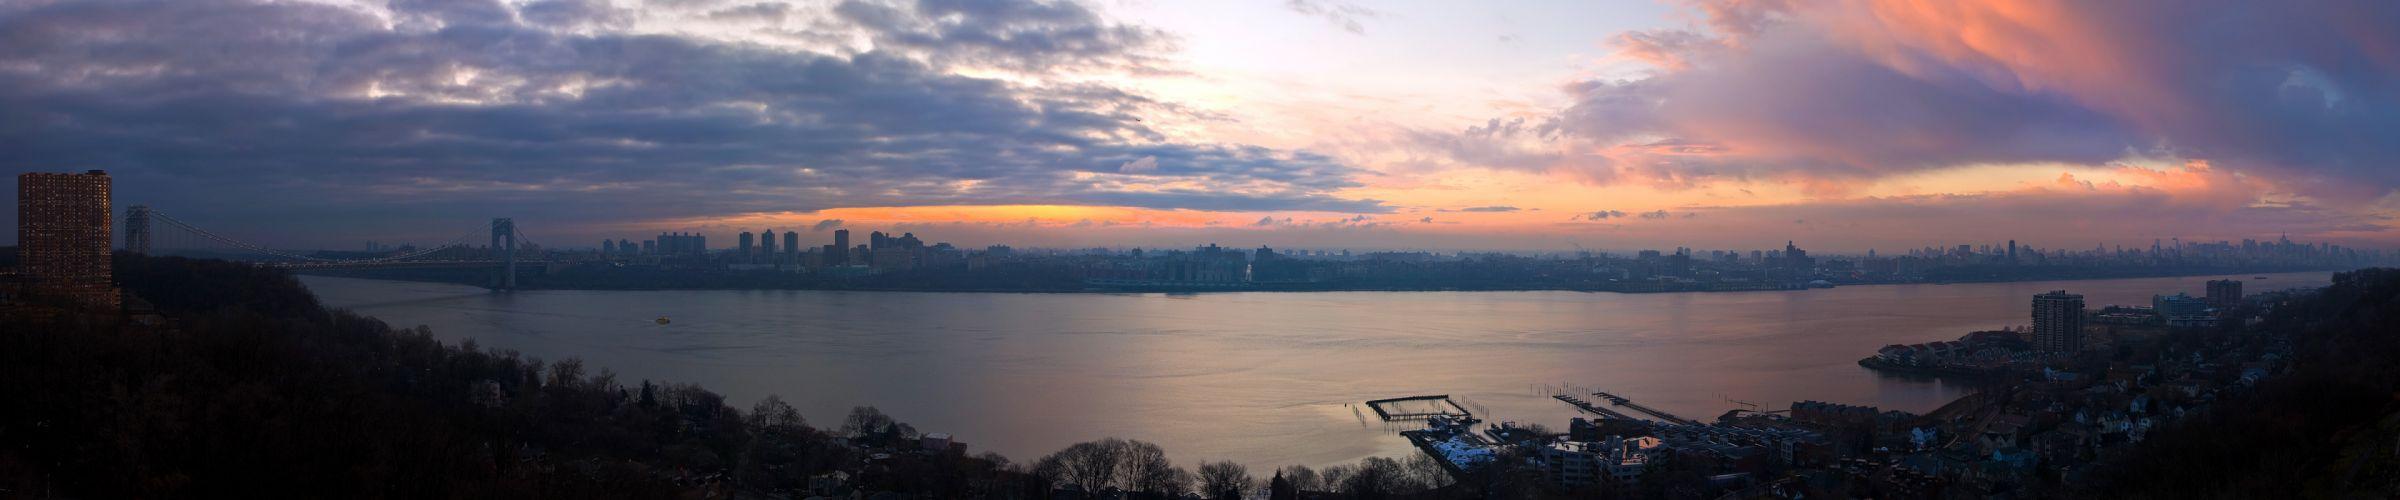 New York Manhattan Hudson River bay g wallpaper